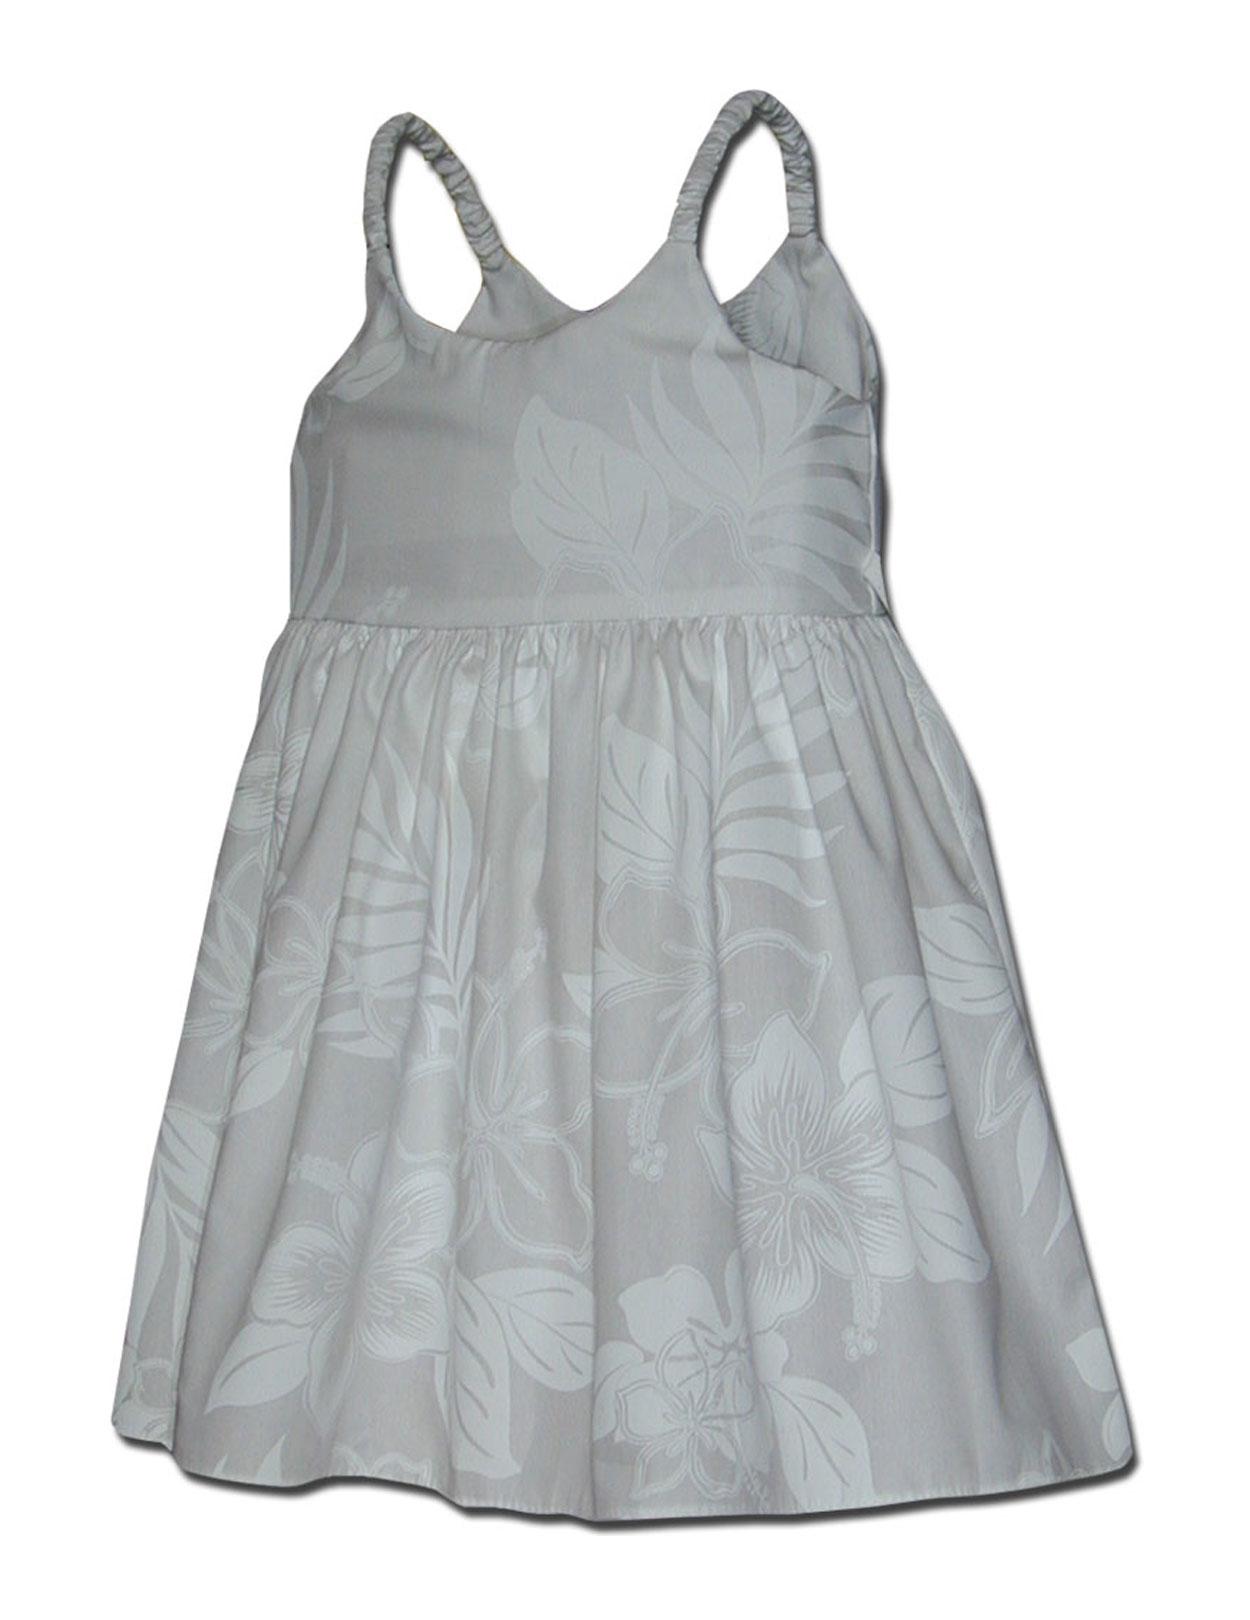 Bungee Little Girls Hawaiian Dress La Ele Shaka Time